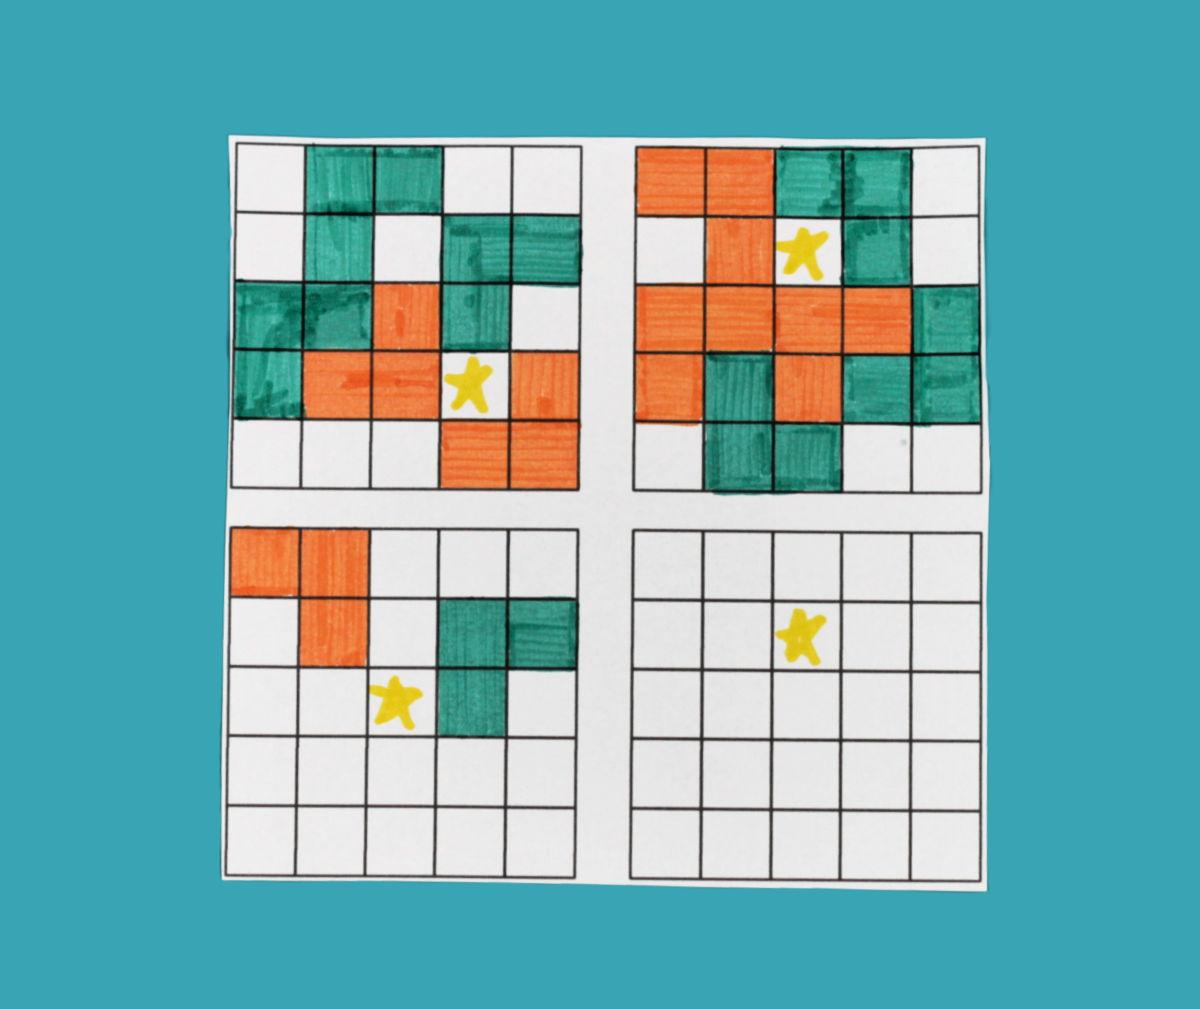 Alternate tromino games